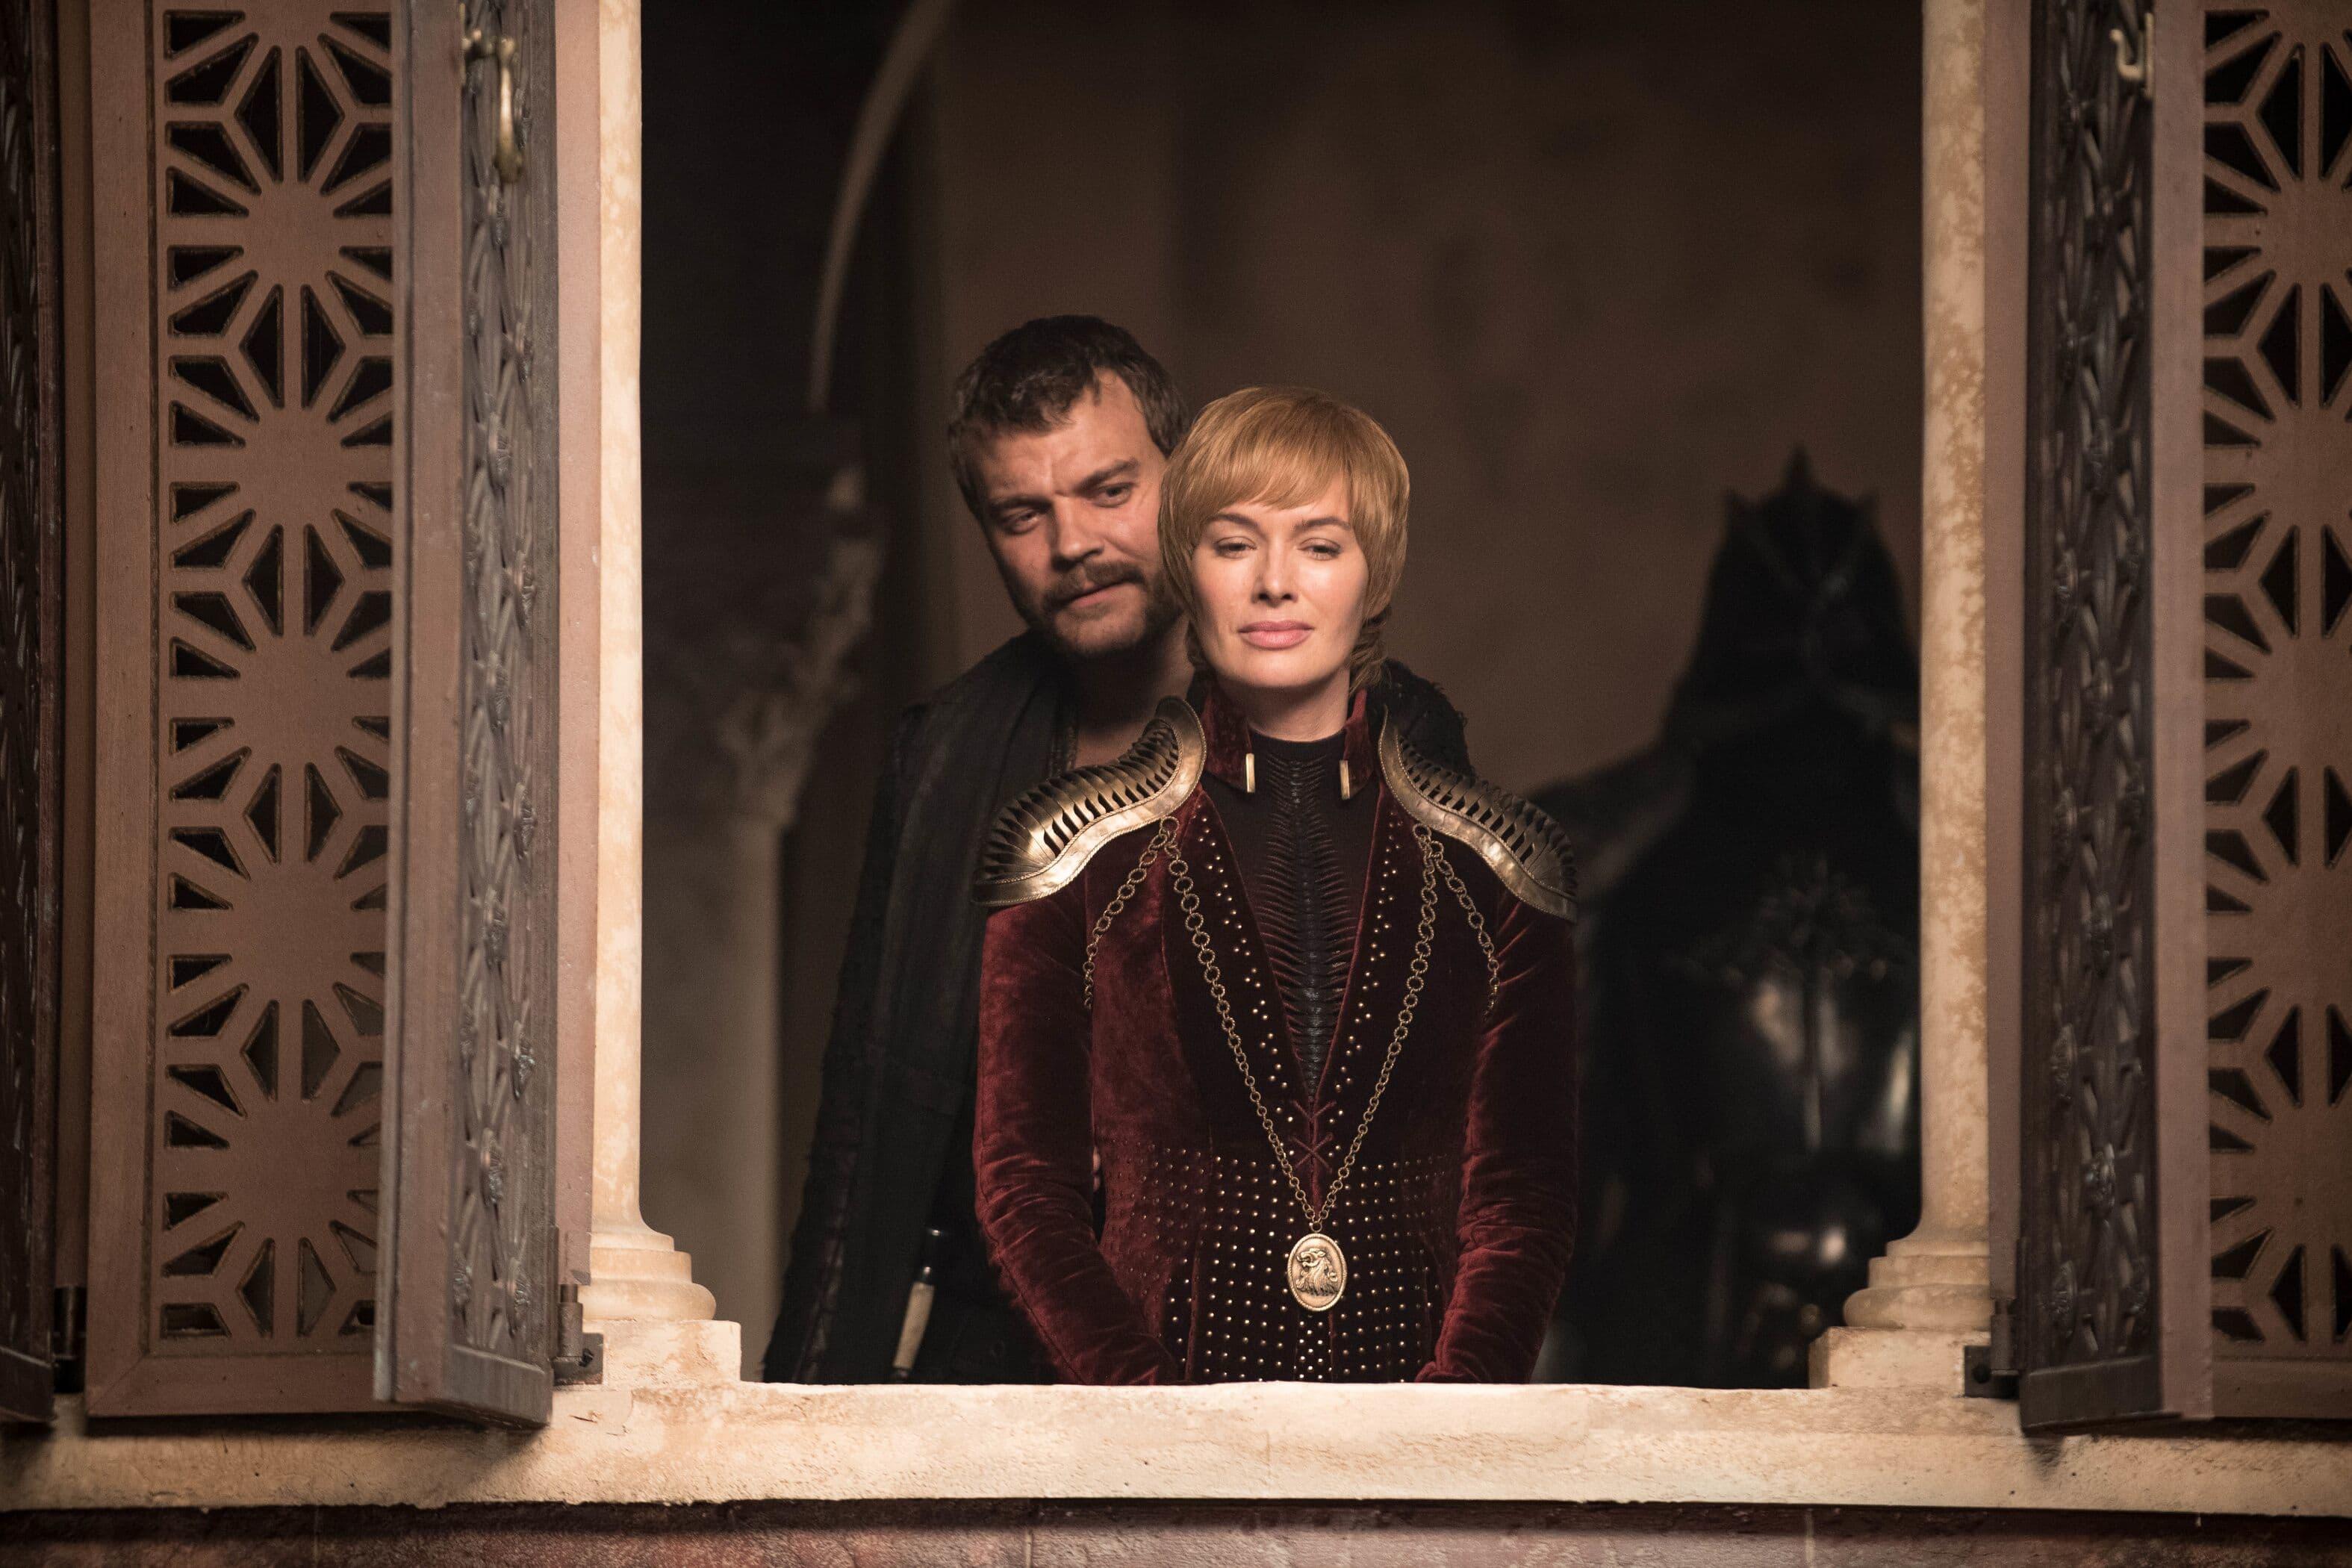 game of thrones season 8 episode 4 putlockers free